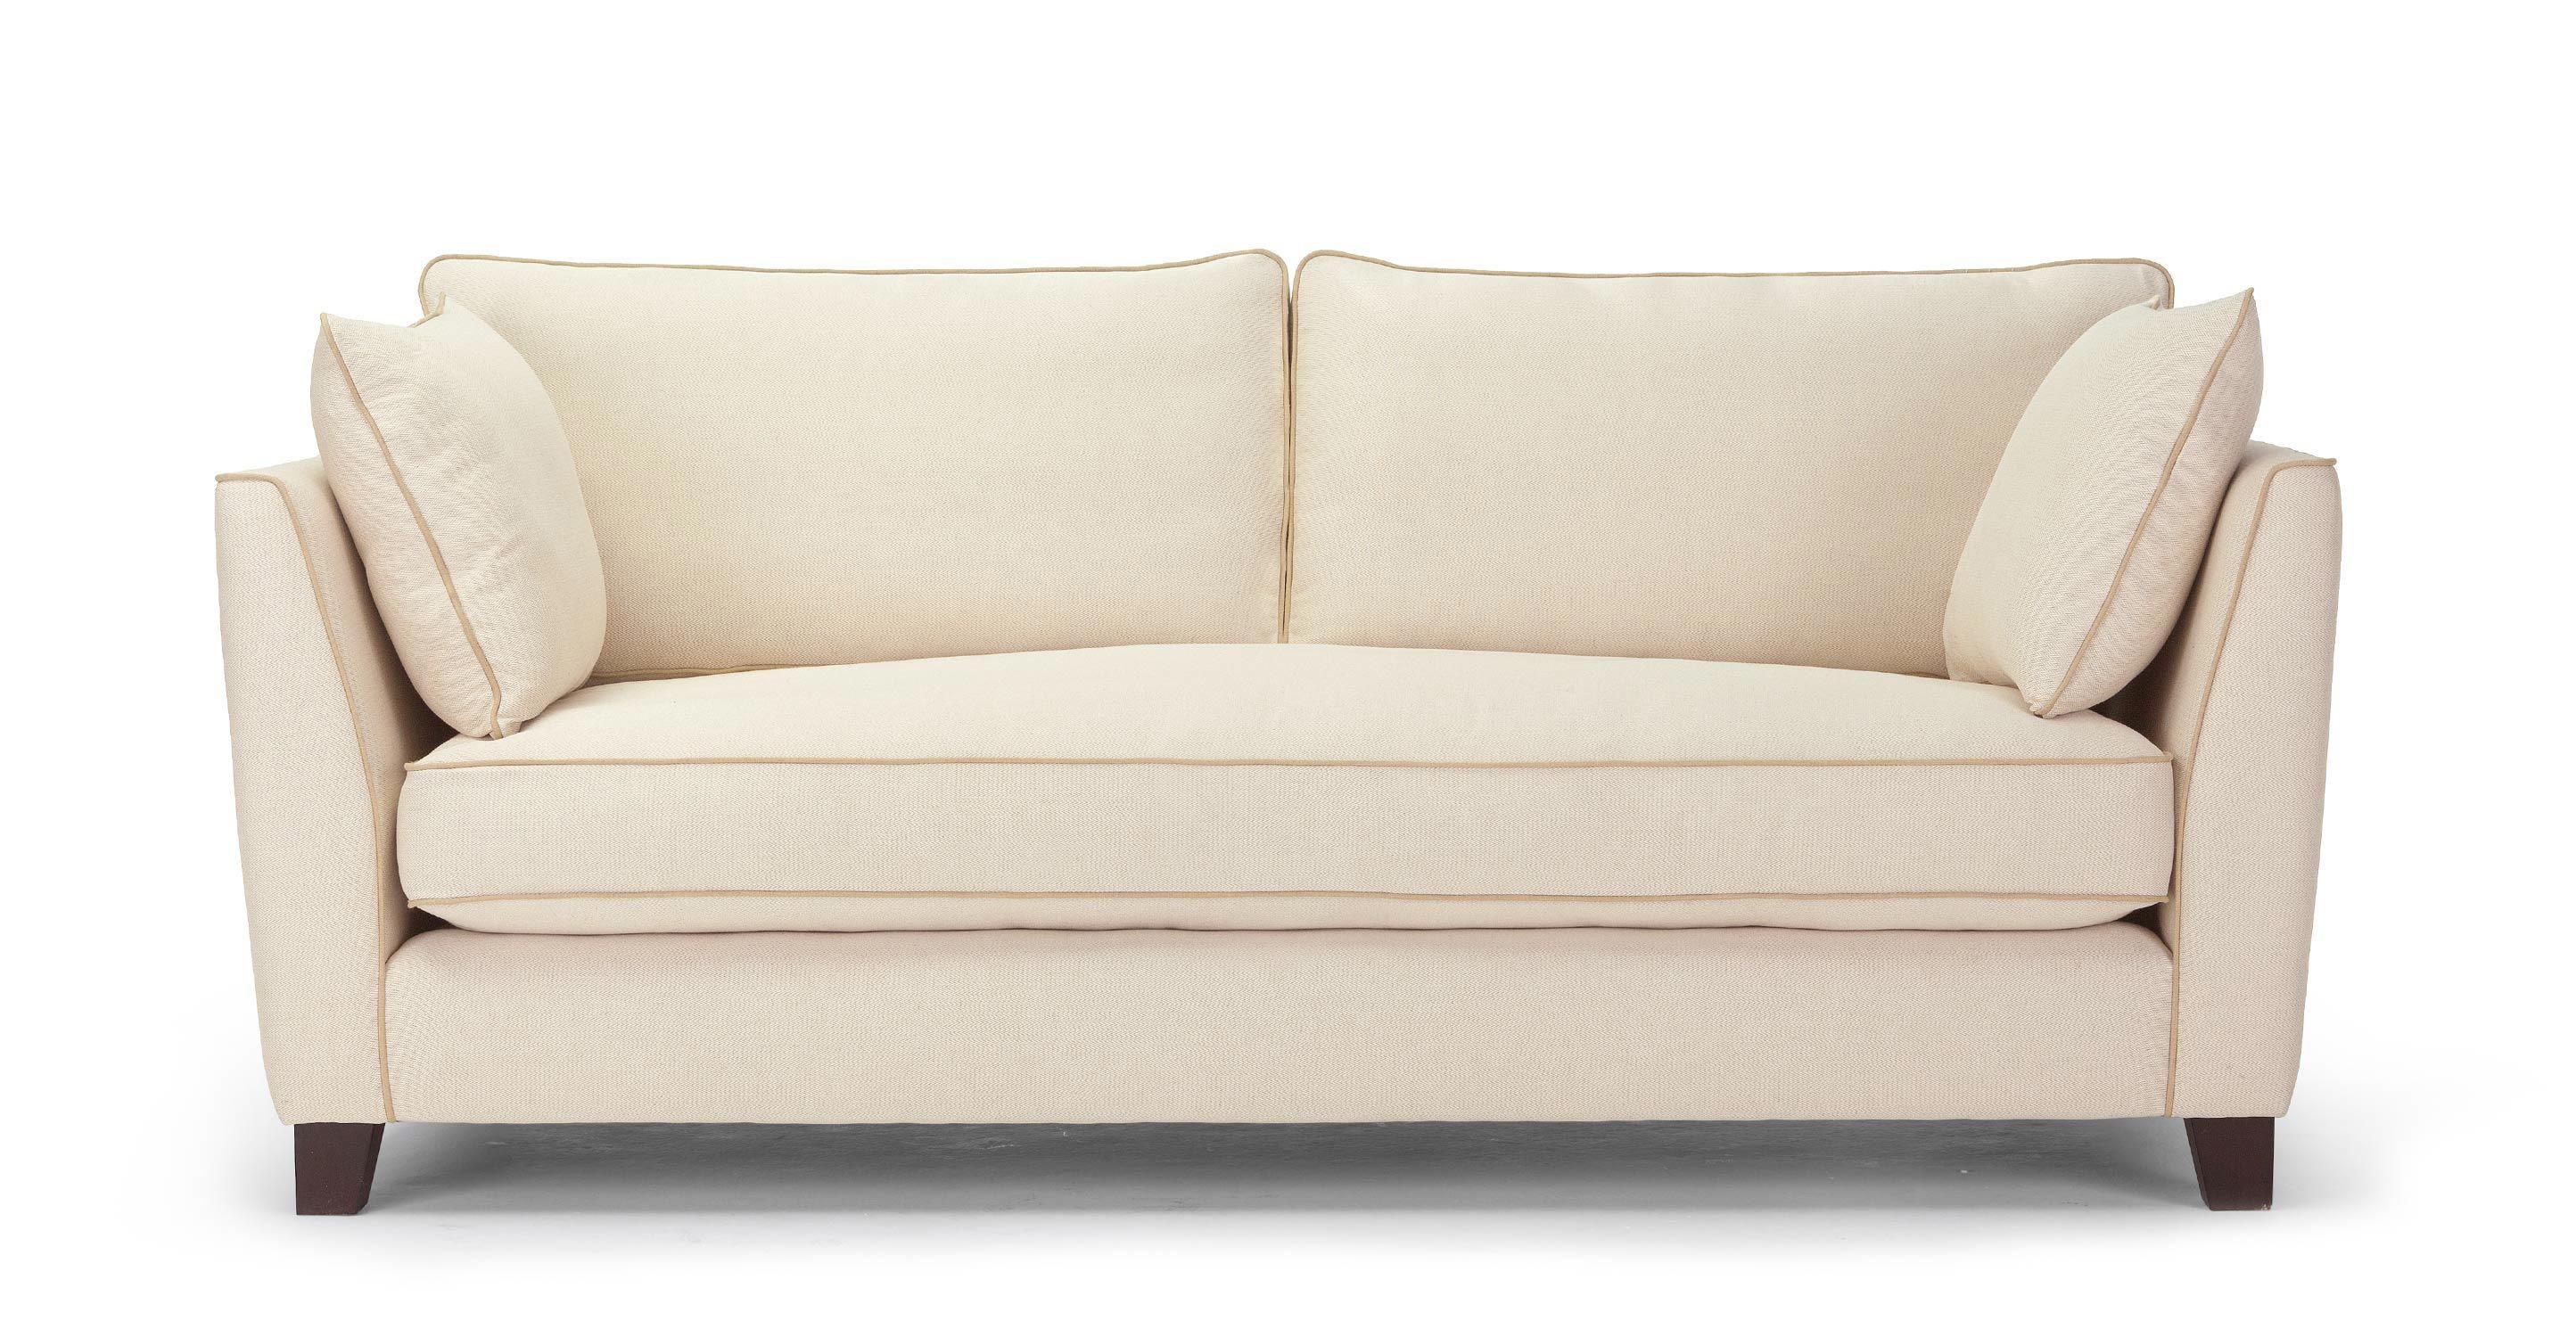 Cream Couch In 2020 3 Seater Sofa Seater Sofa Sofa